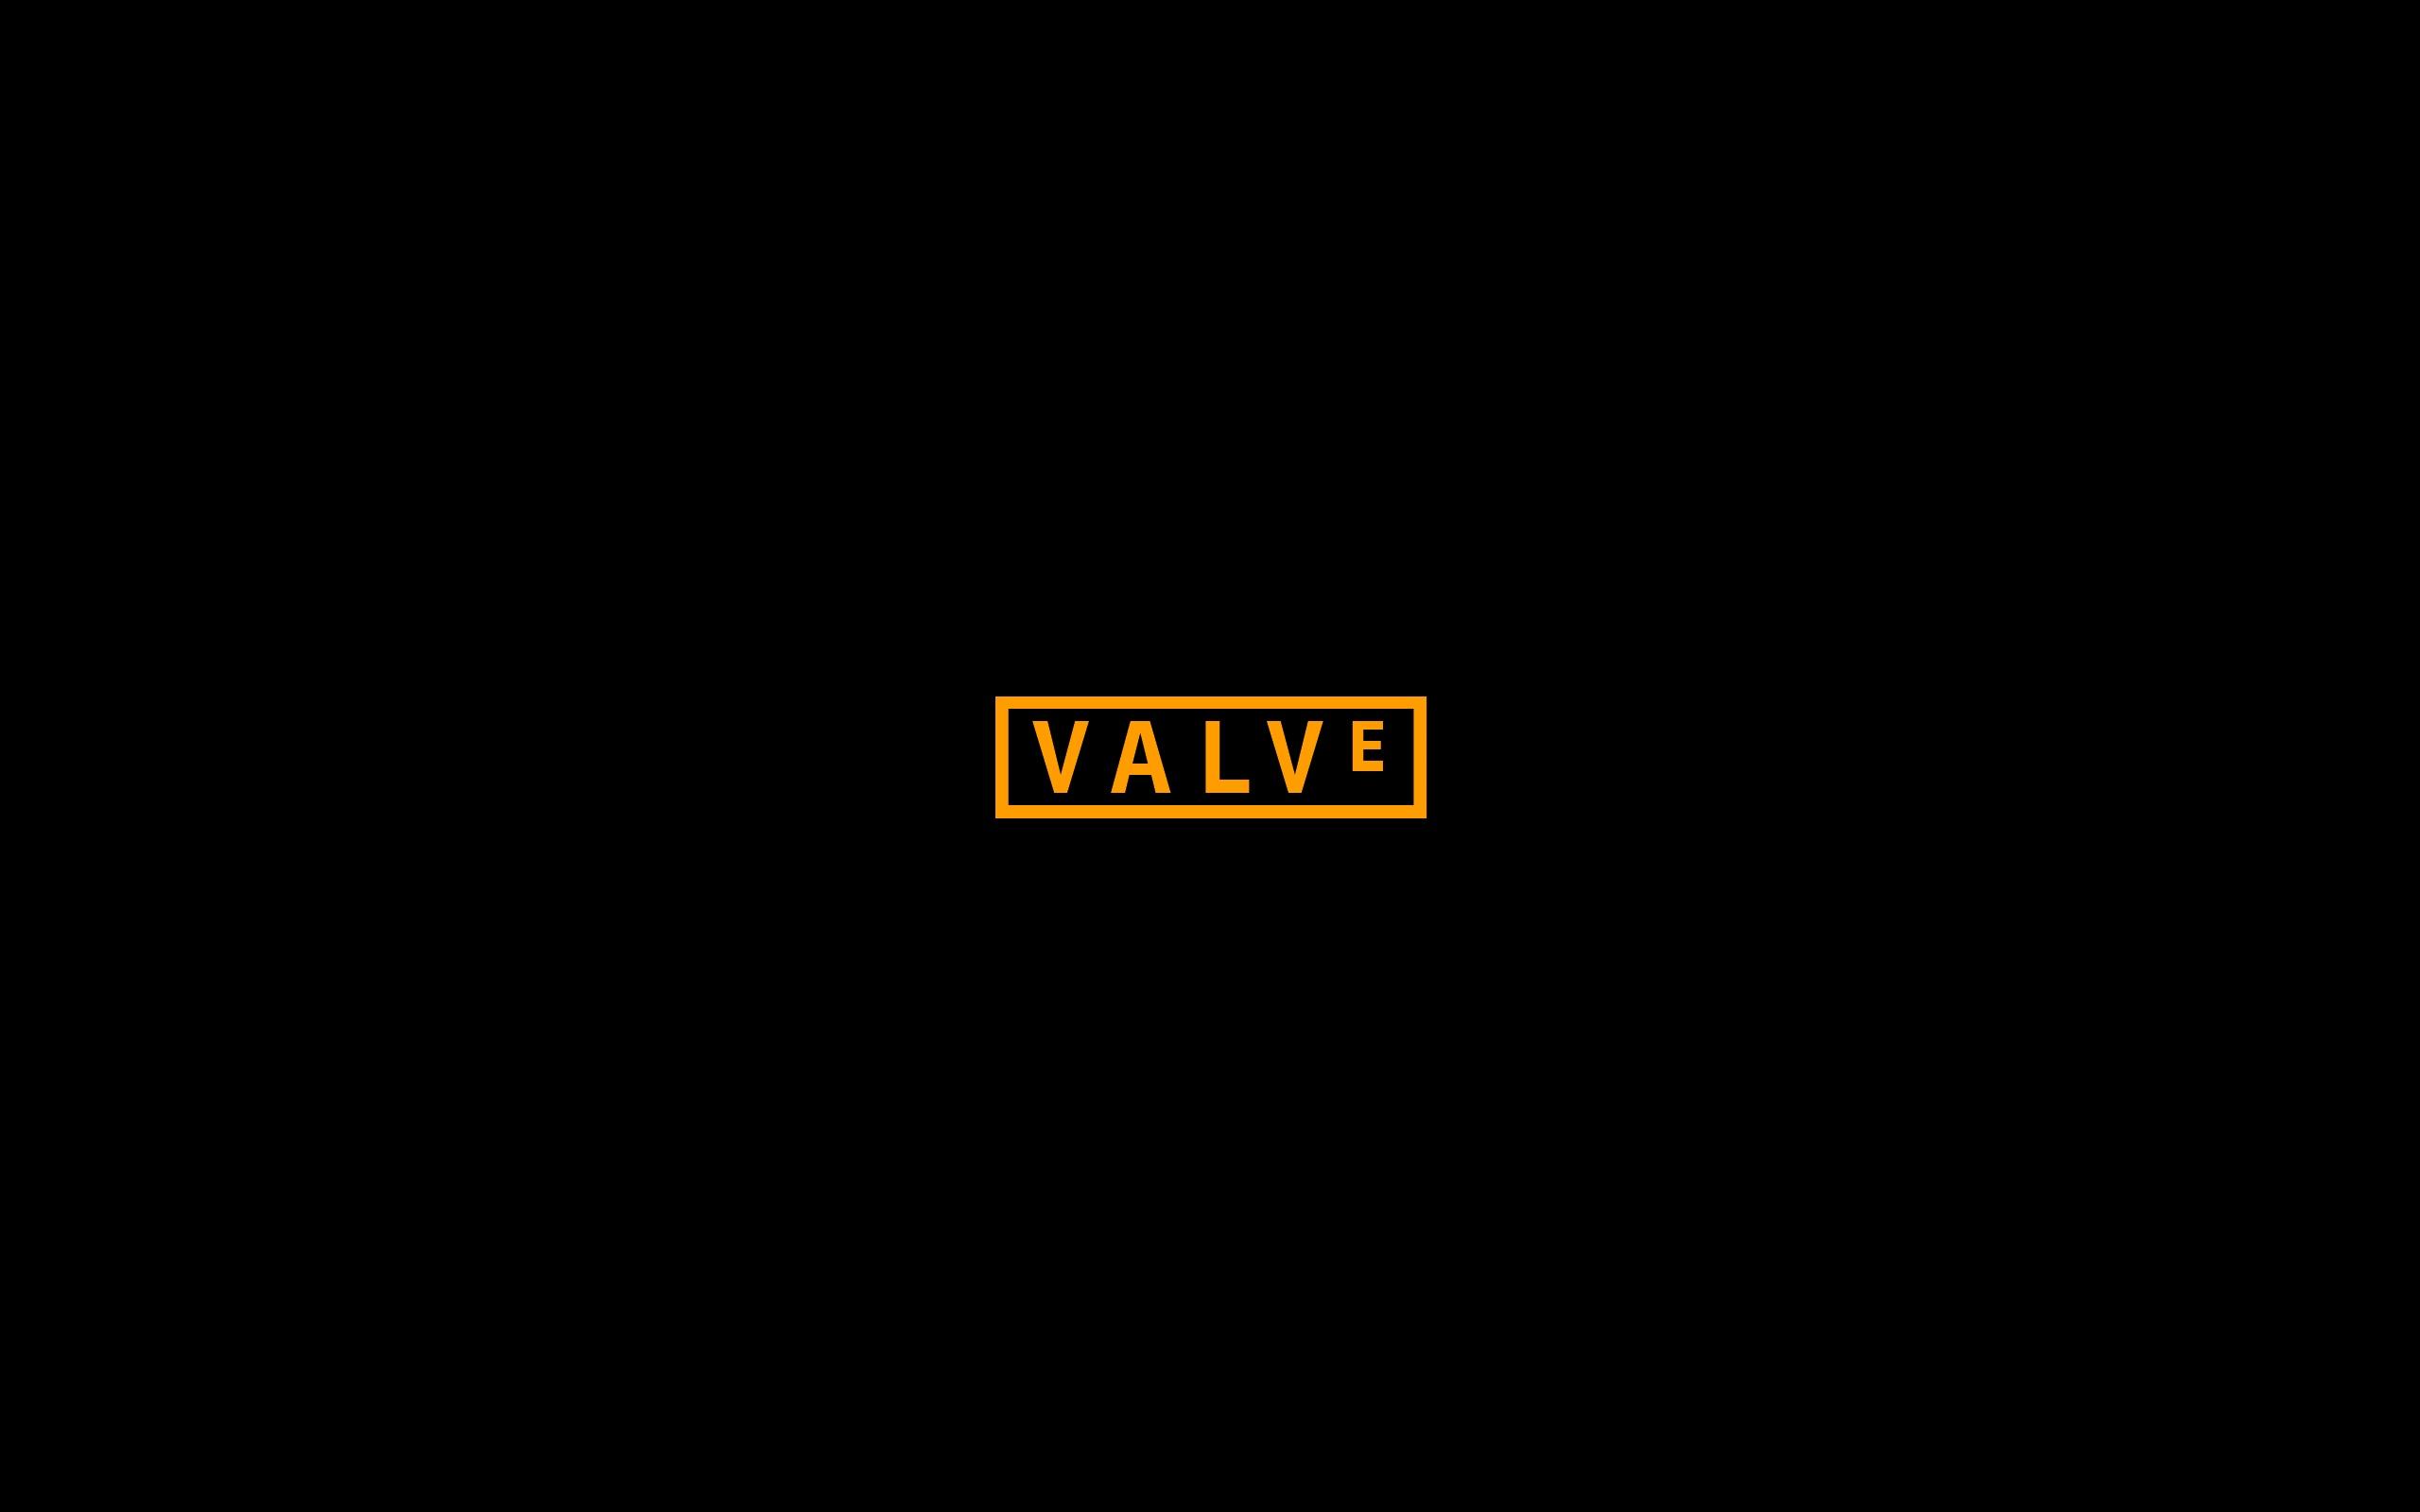 valve logo wallpaper 41551